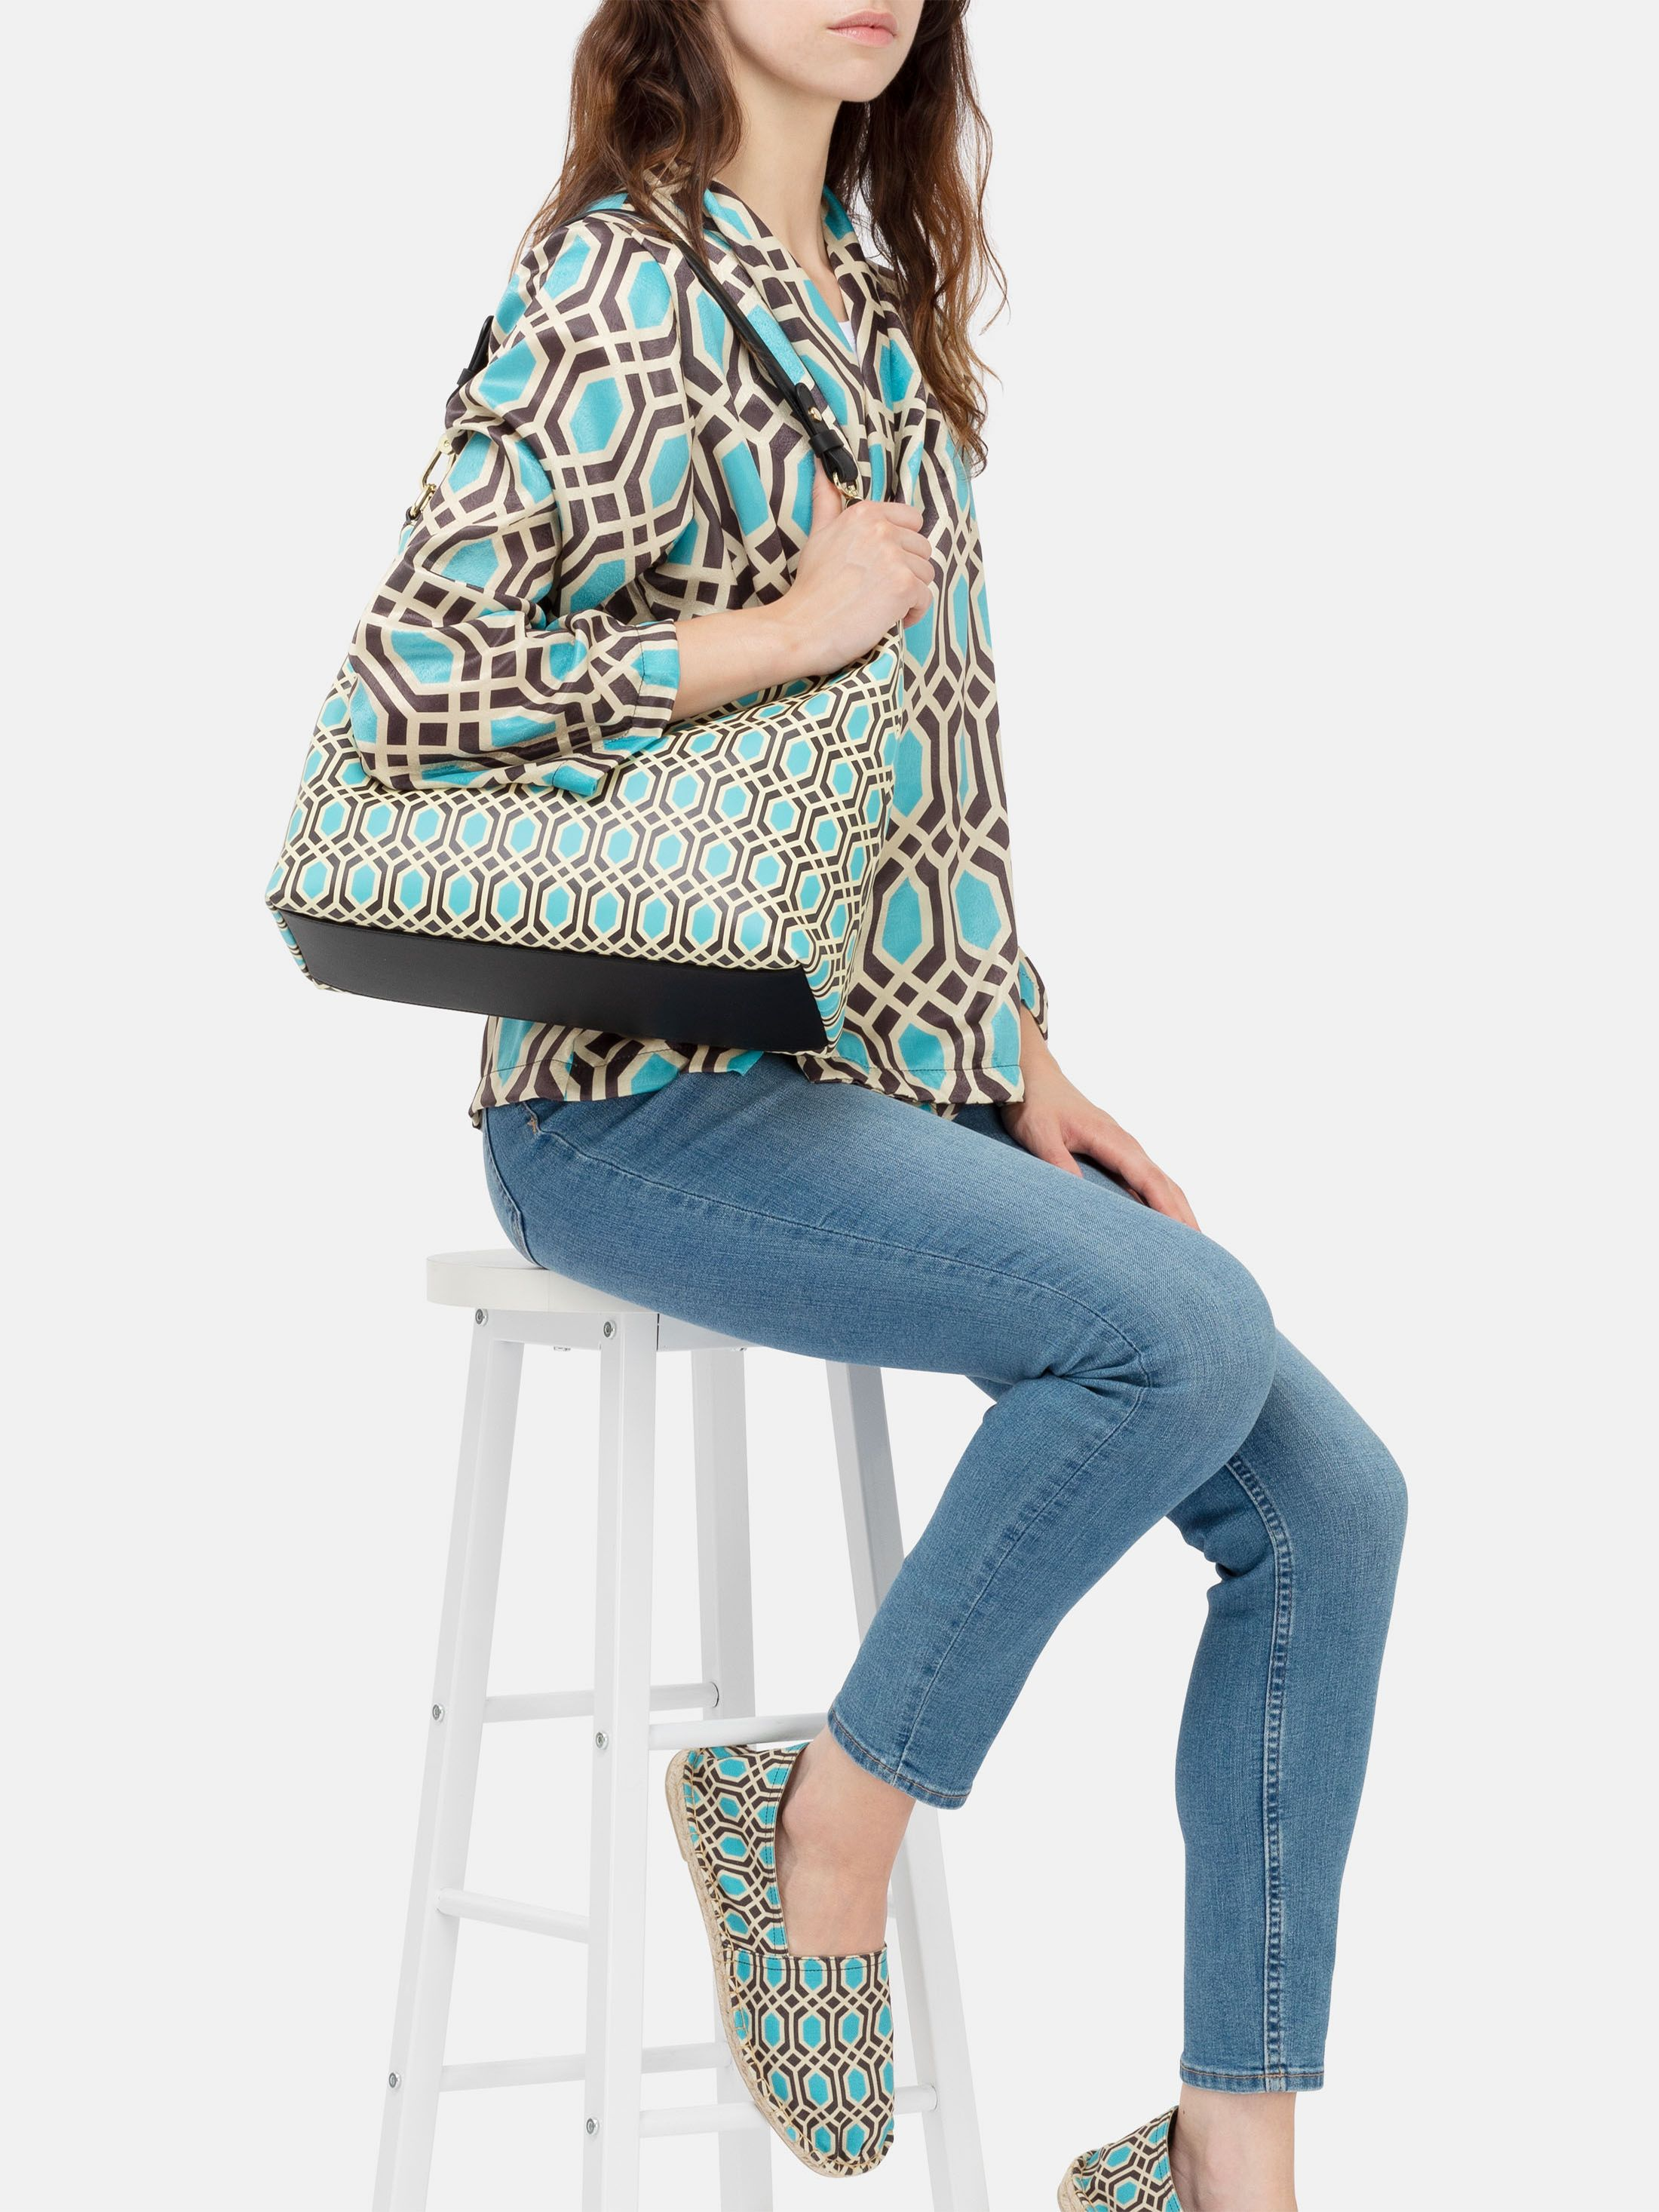 Hobo Tasche selbst designen